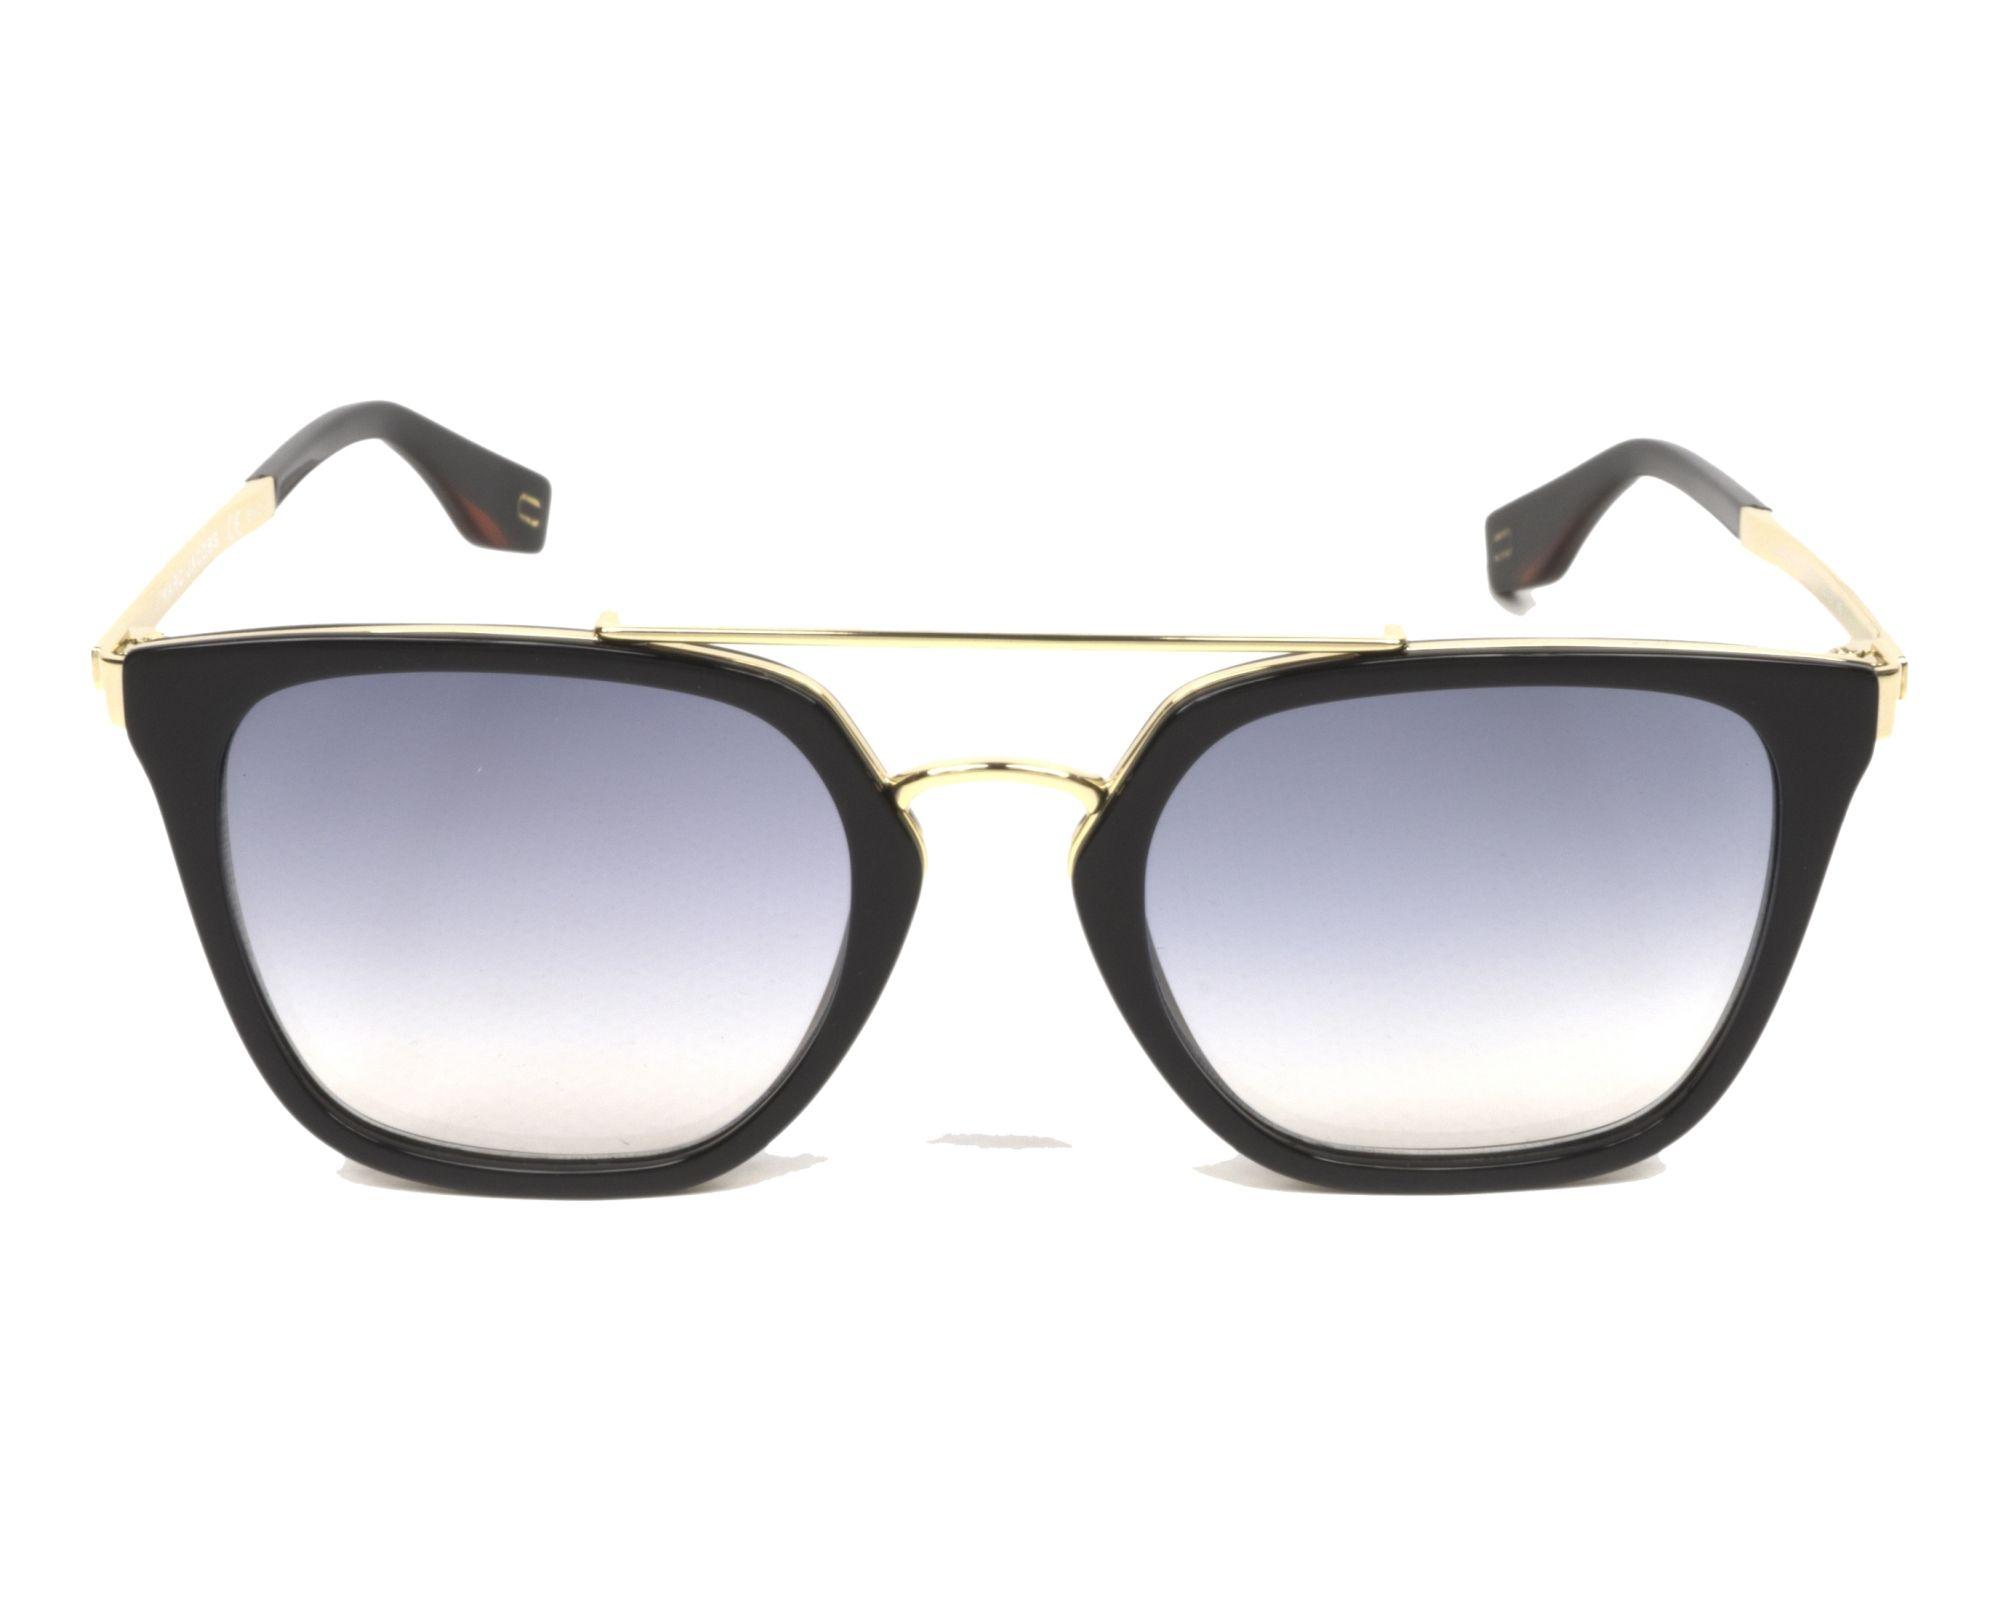 MARC JACOBS Marc Jacobs Herren Sonnenbrille » MARC 270/S«, schwarz, 807/1V - schwarz/ gold